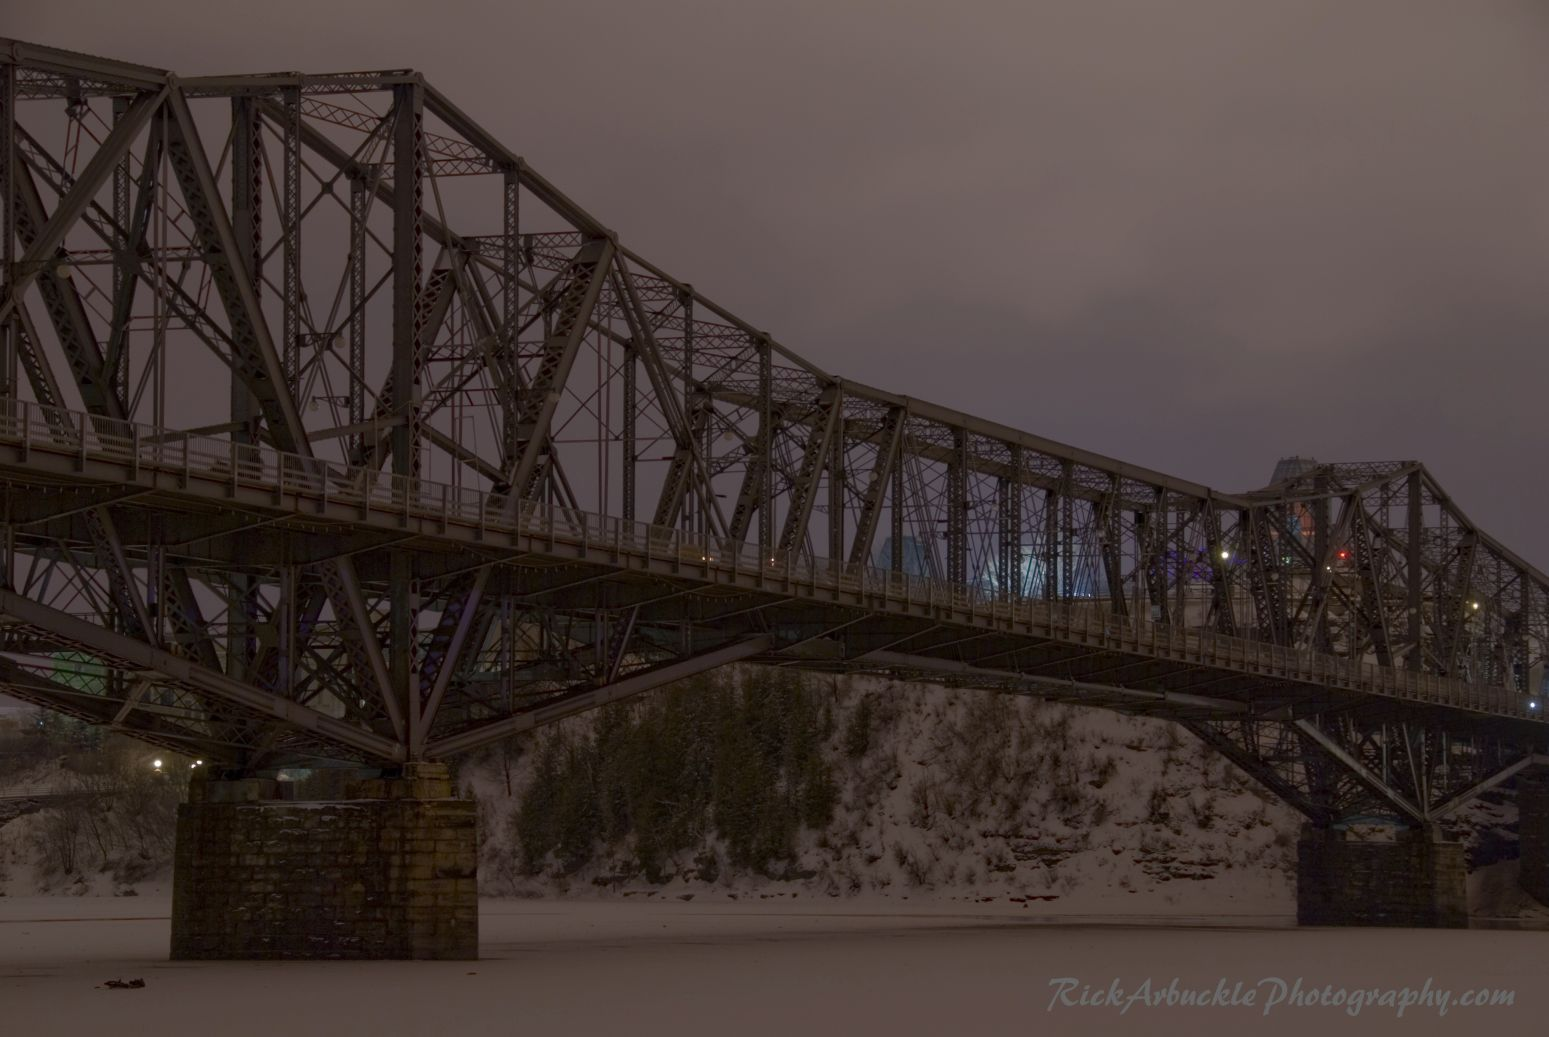 Bridge Over Frozen River at Night copy.jpg